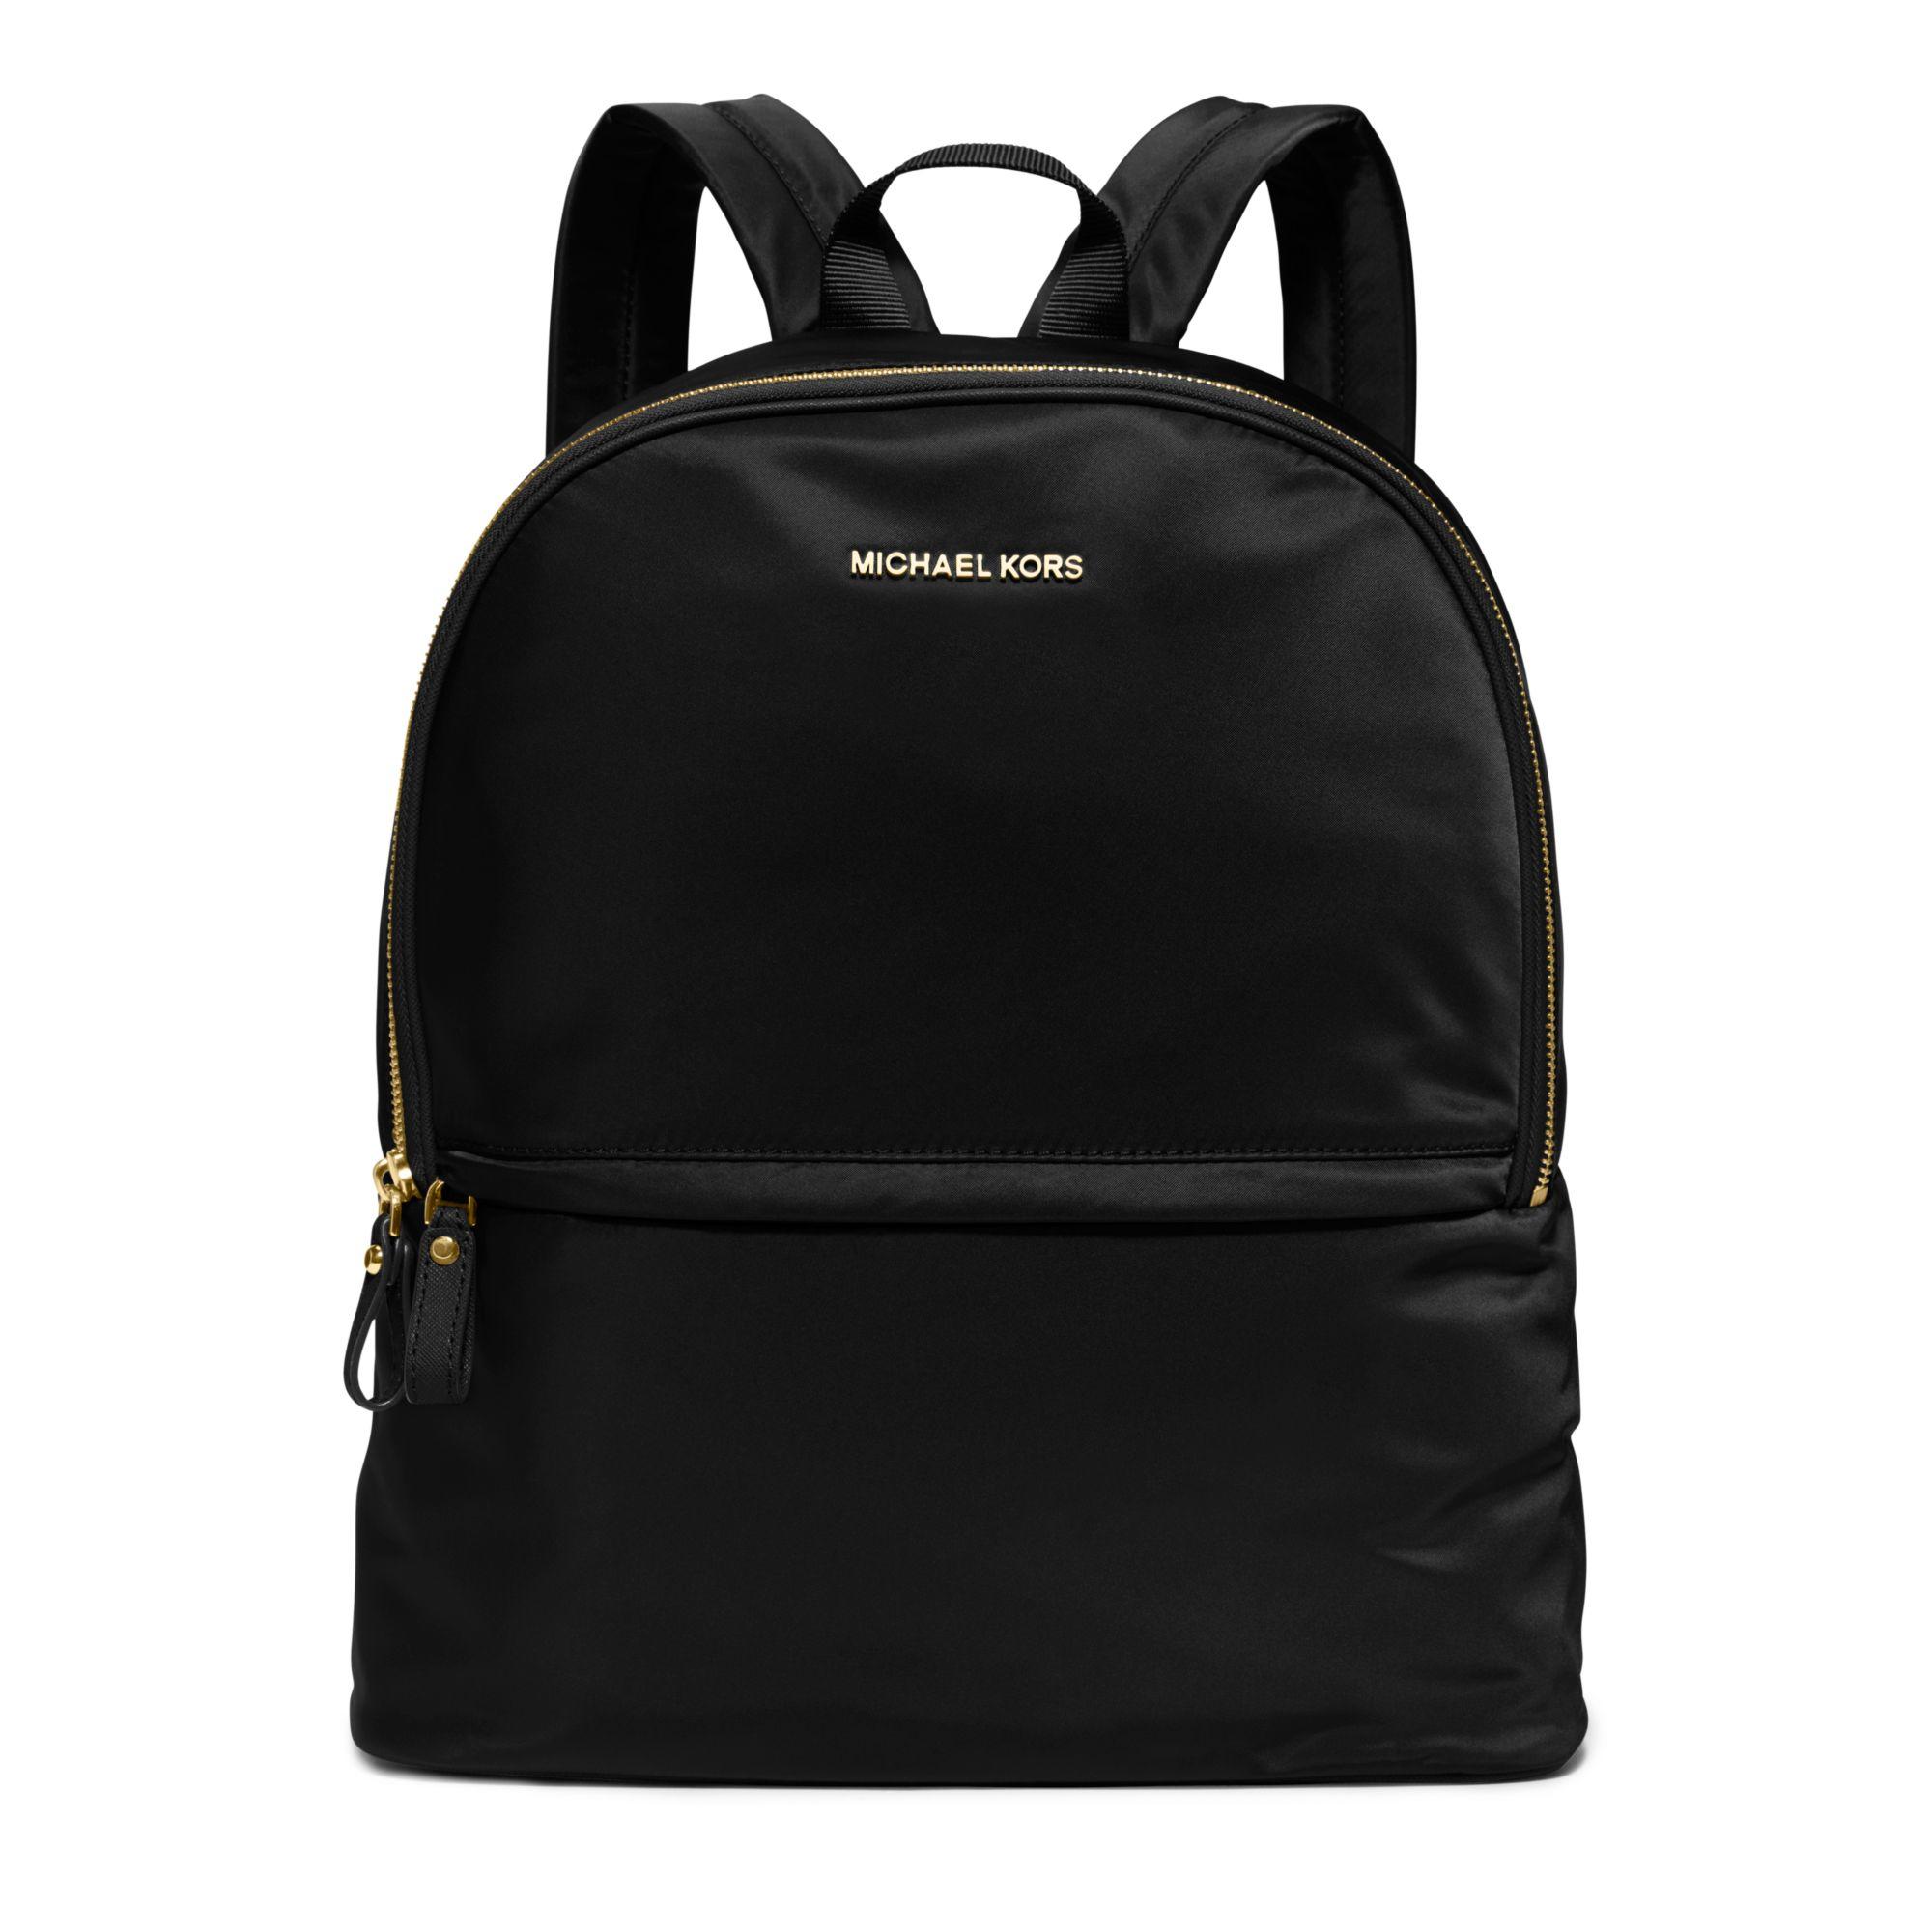 6d5ca36bf261 ... Michael kors Kieran Large Nylon Backpack in Black Lyst ...